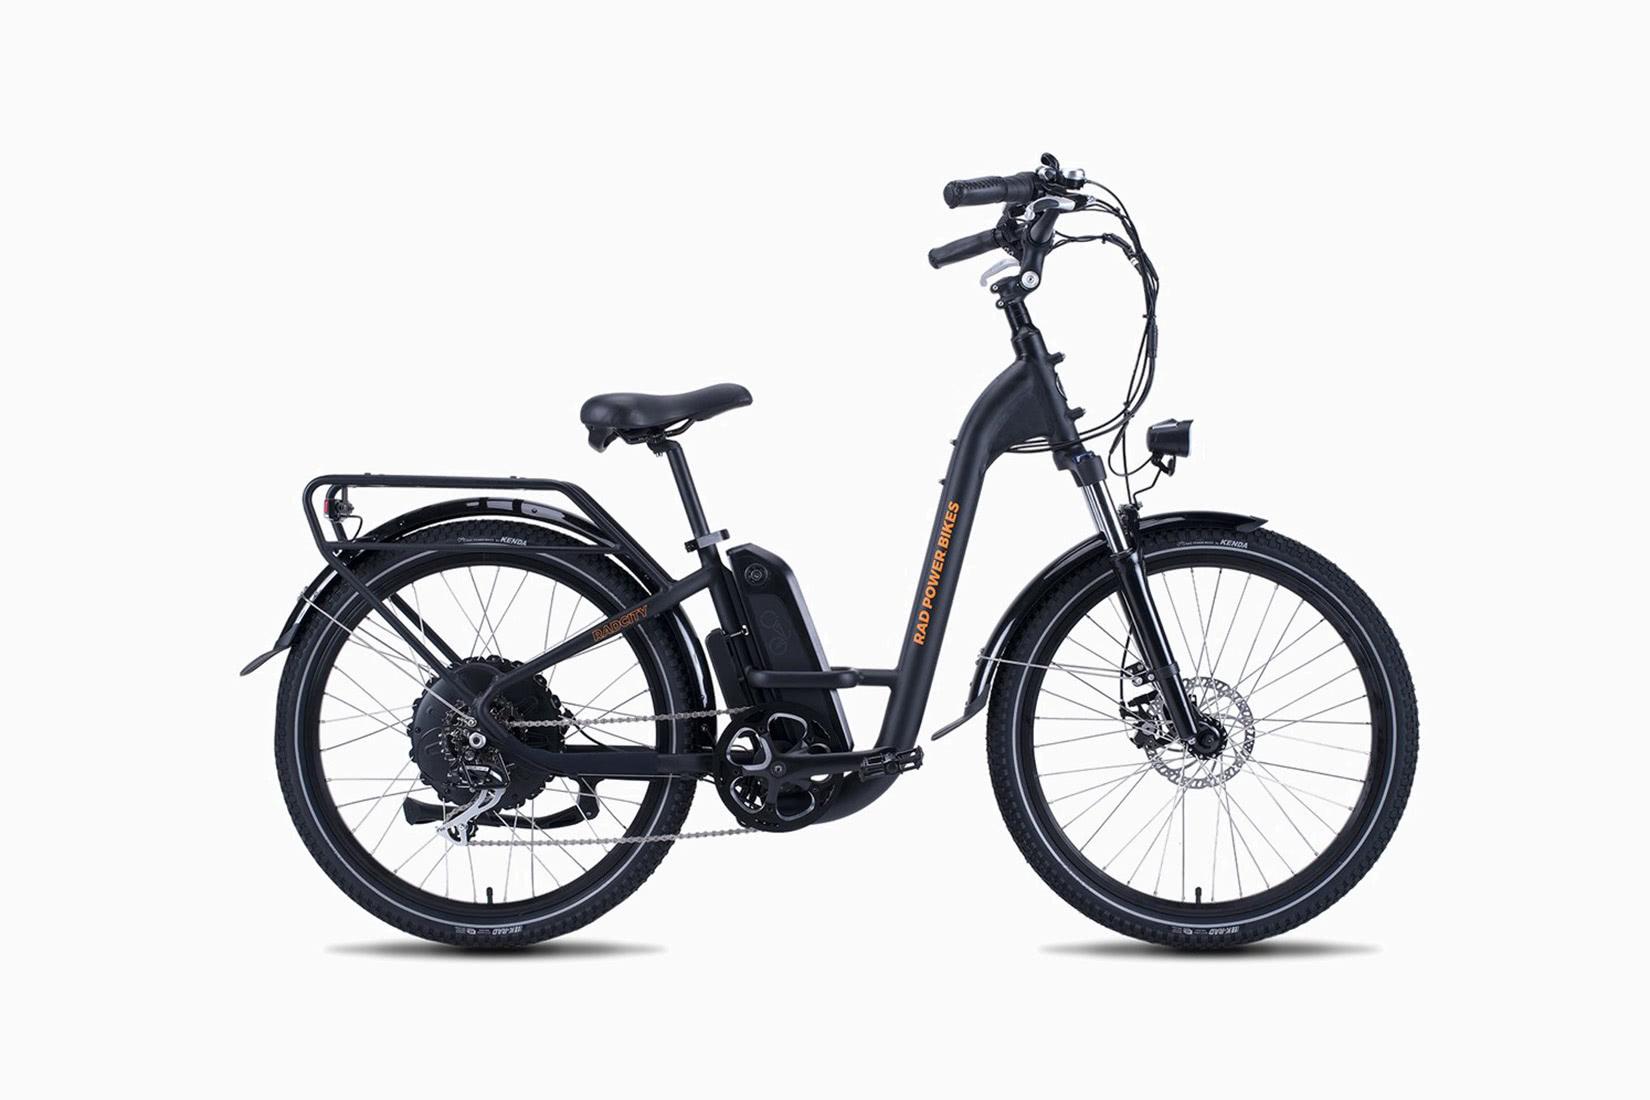 rad power bikes review radcity luxe digital